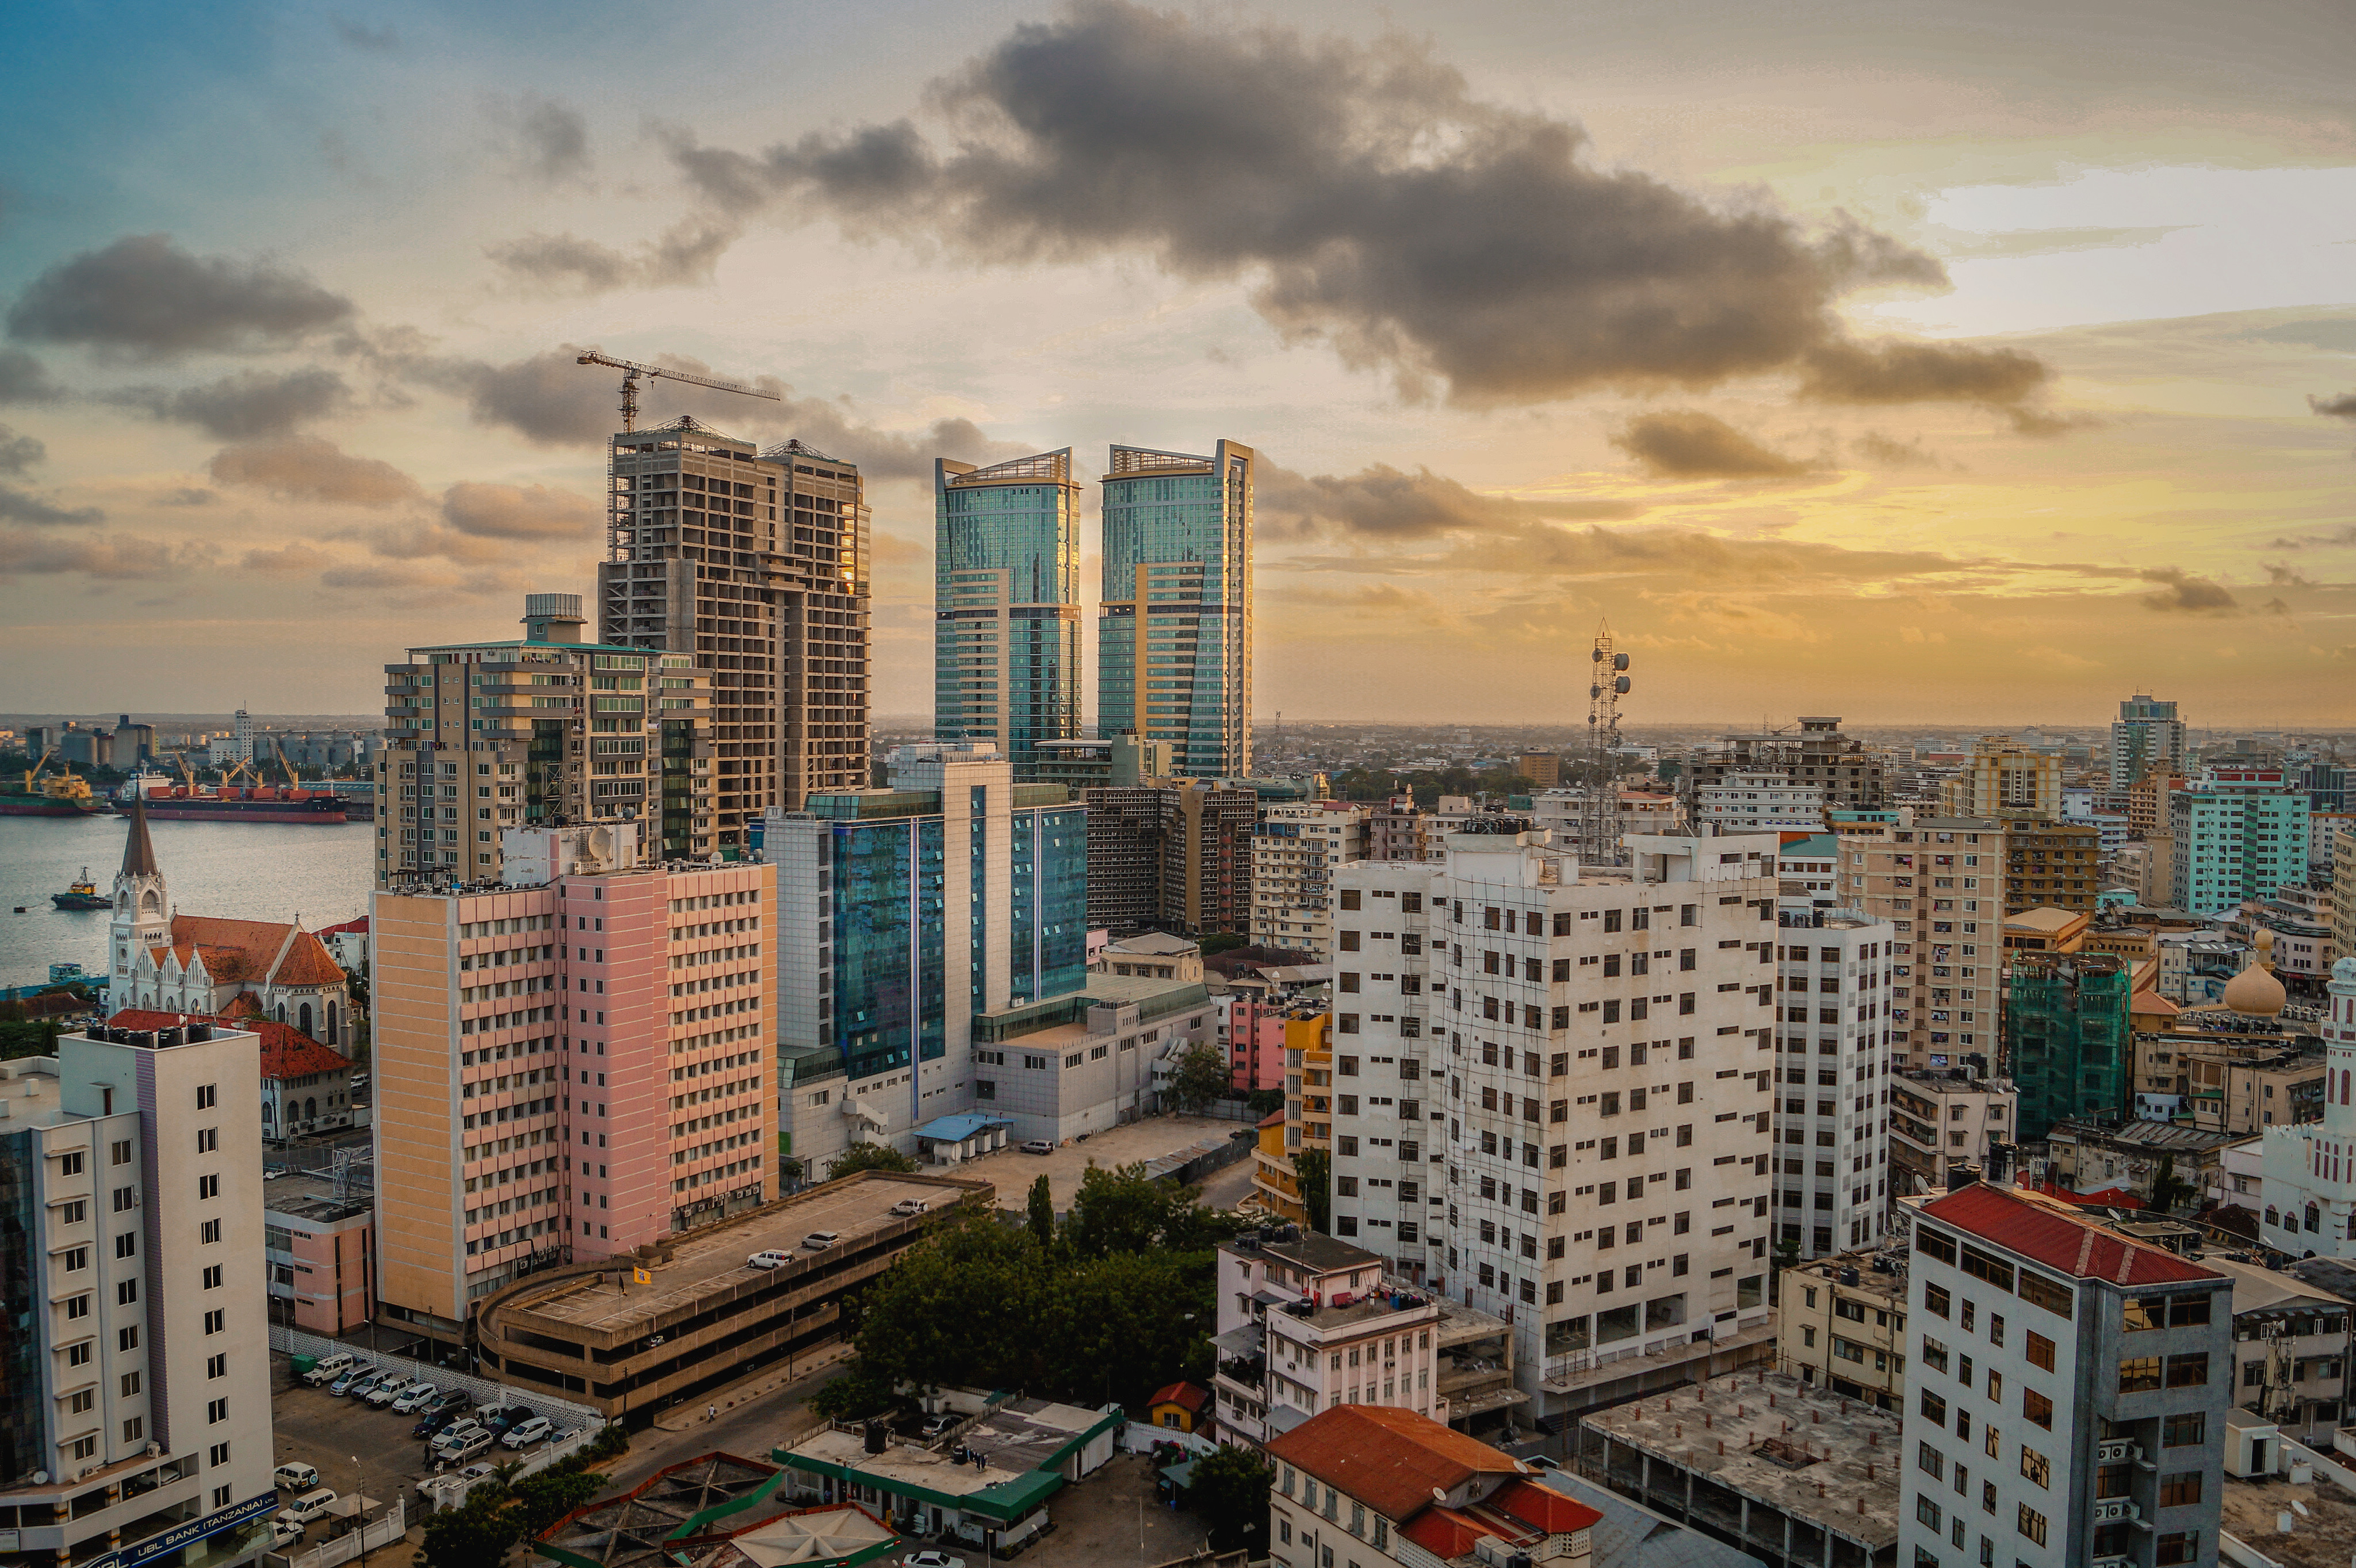 Dar es Salaam Skyline Sunset, Tanzania